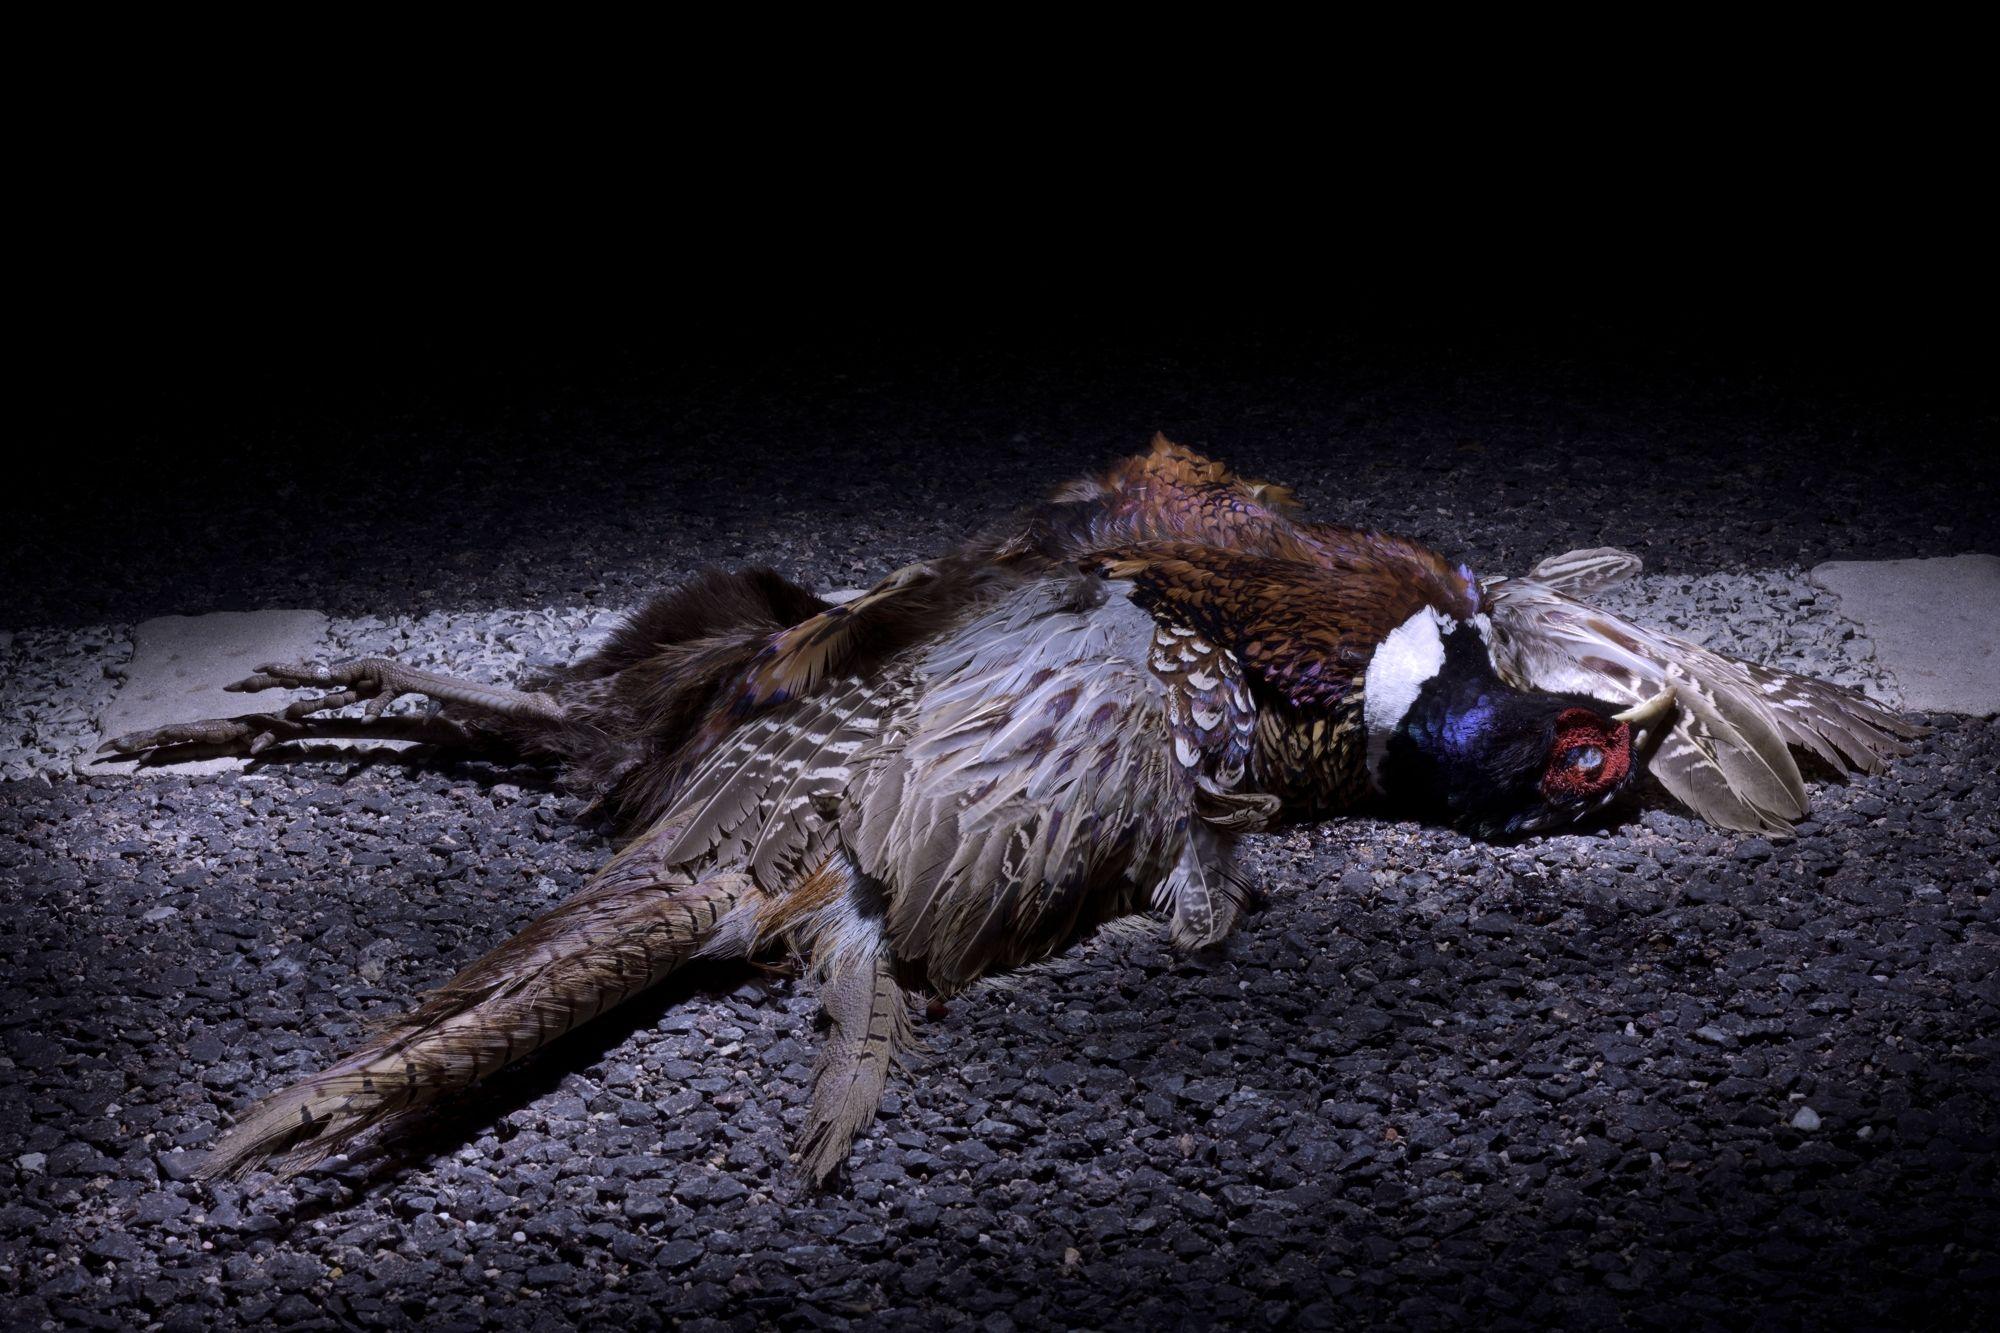 El arte de fotografiar fauna atropellada